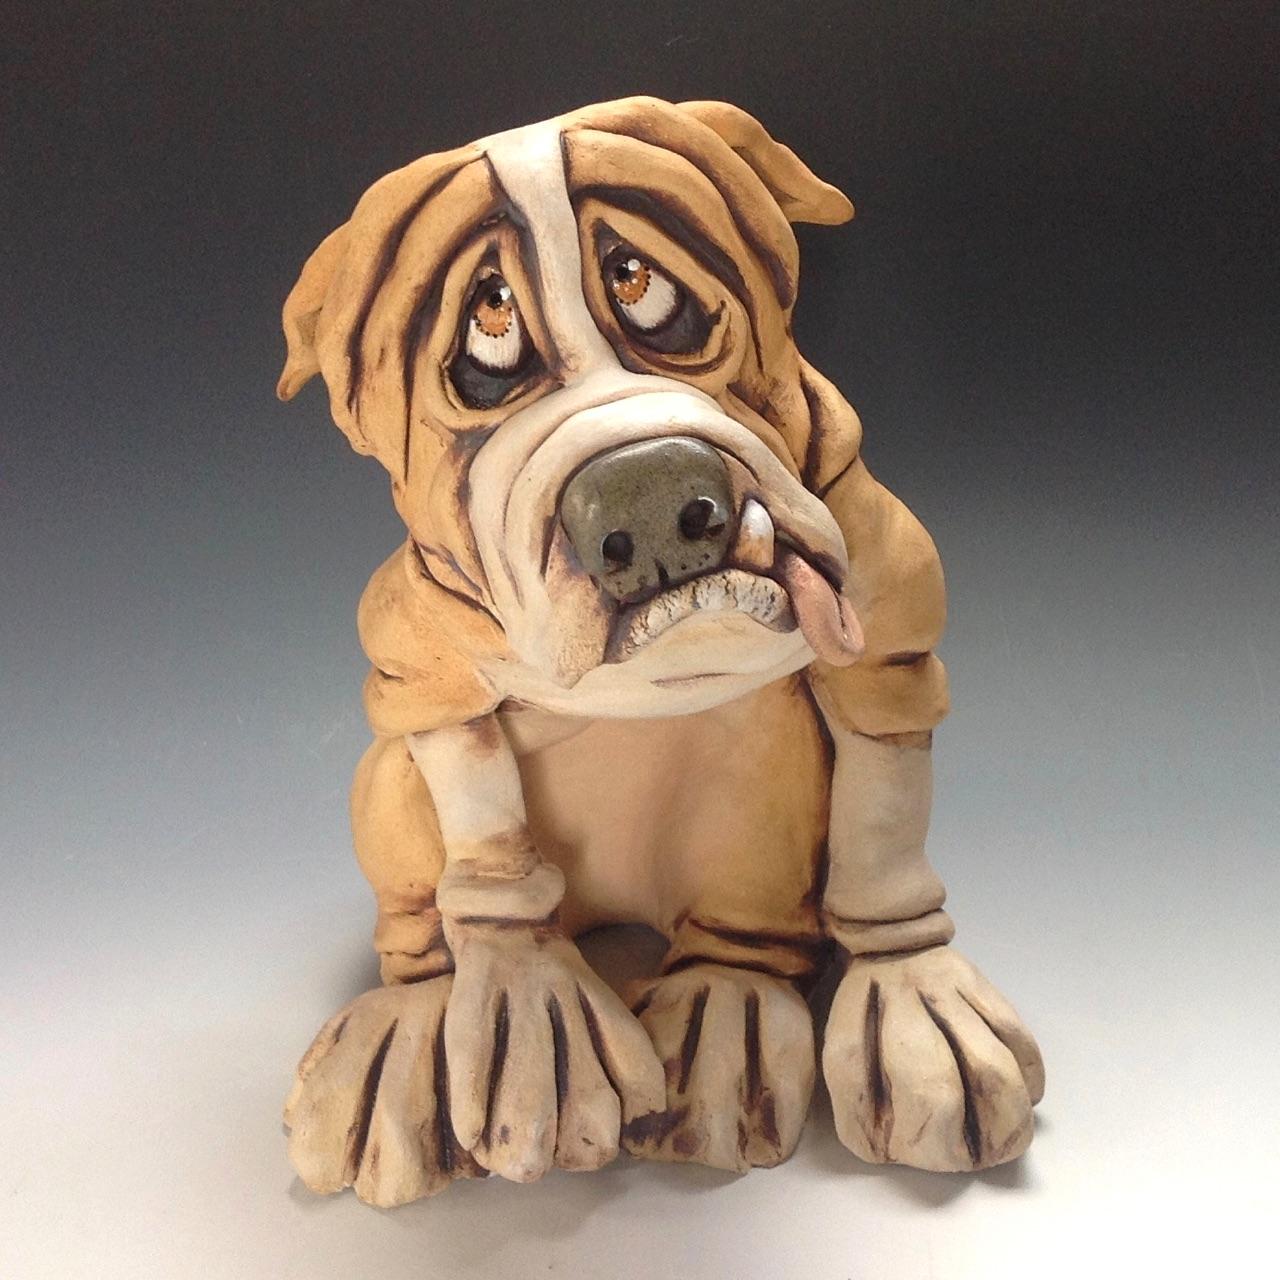 Engliosh Bulldog Dog Sculpture Ceramic